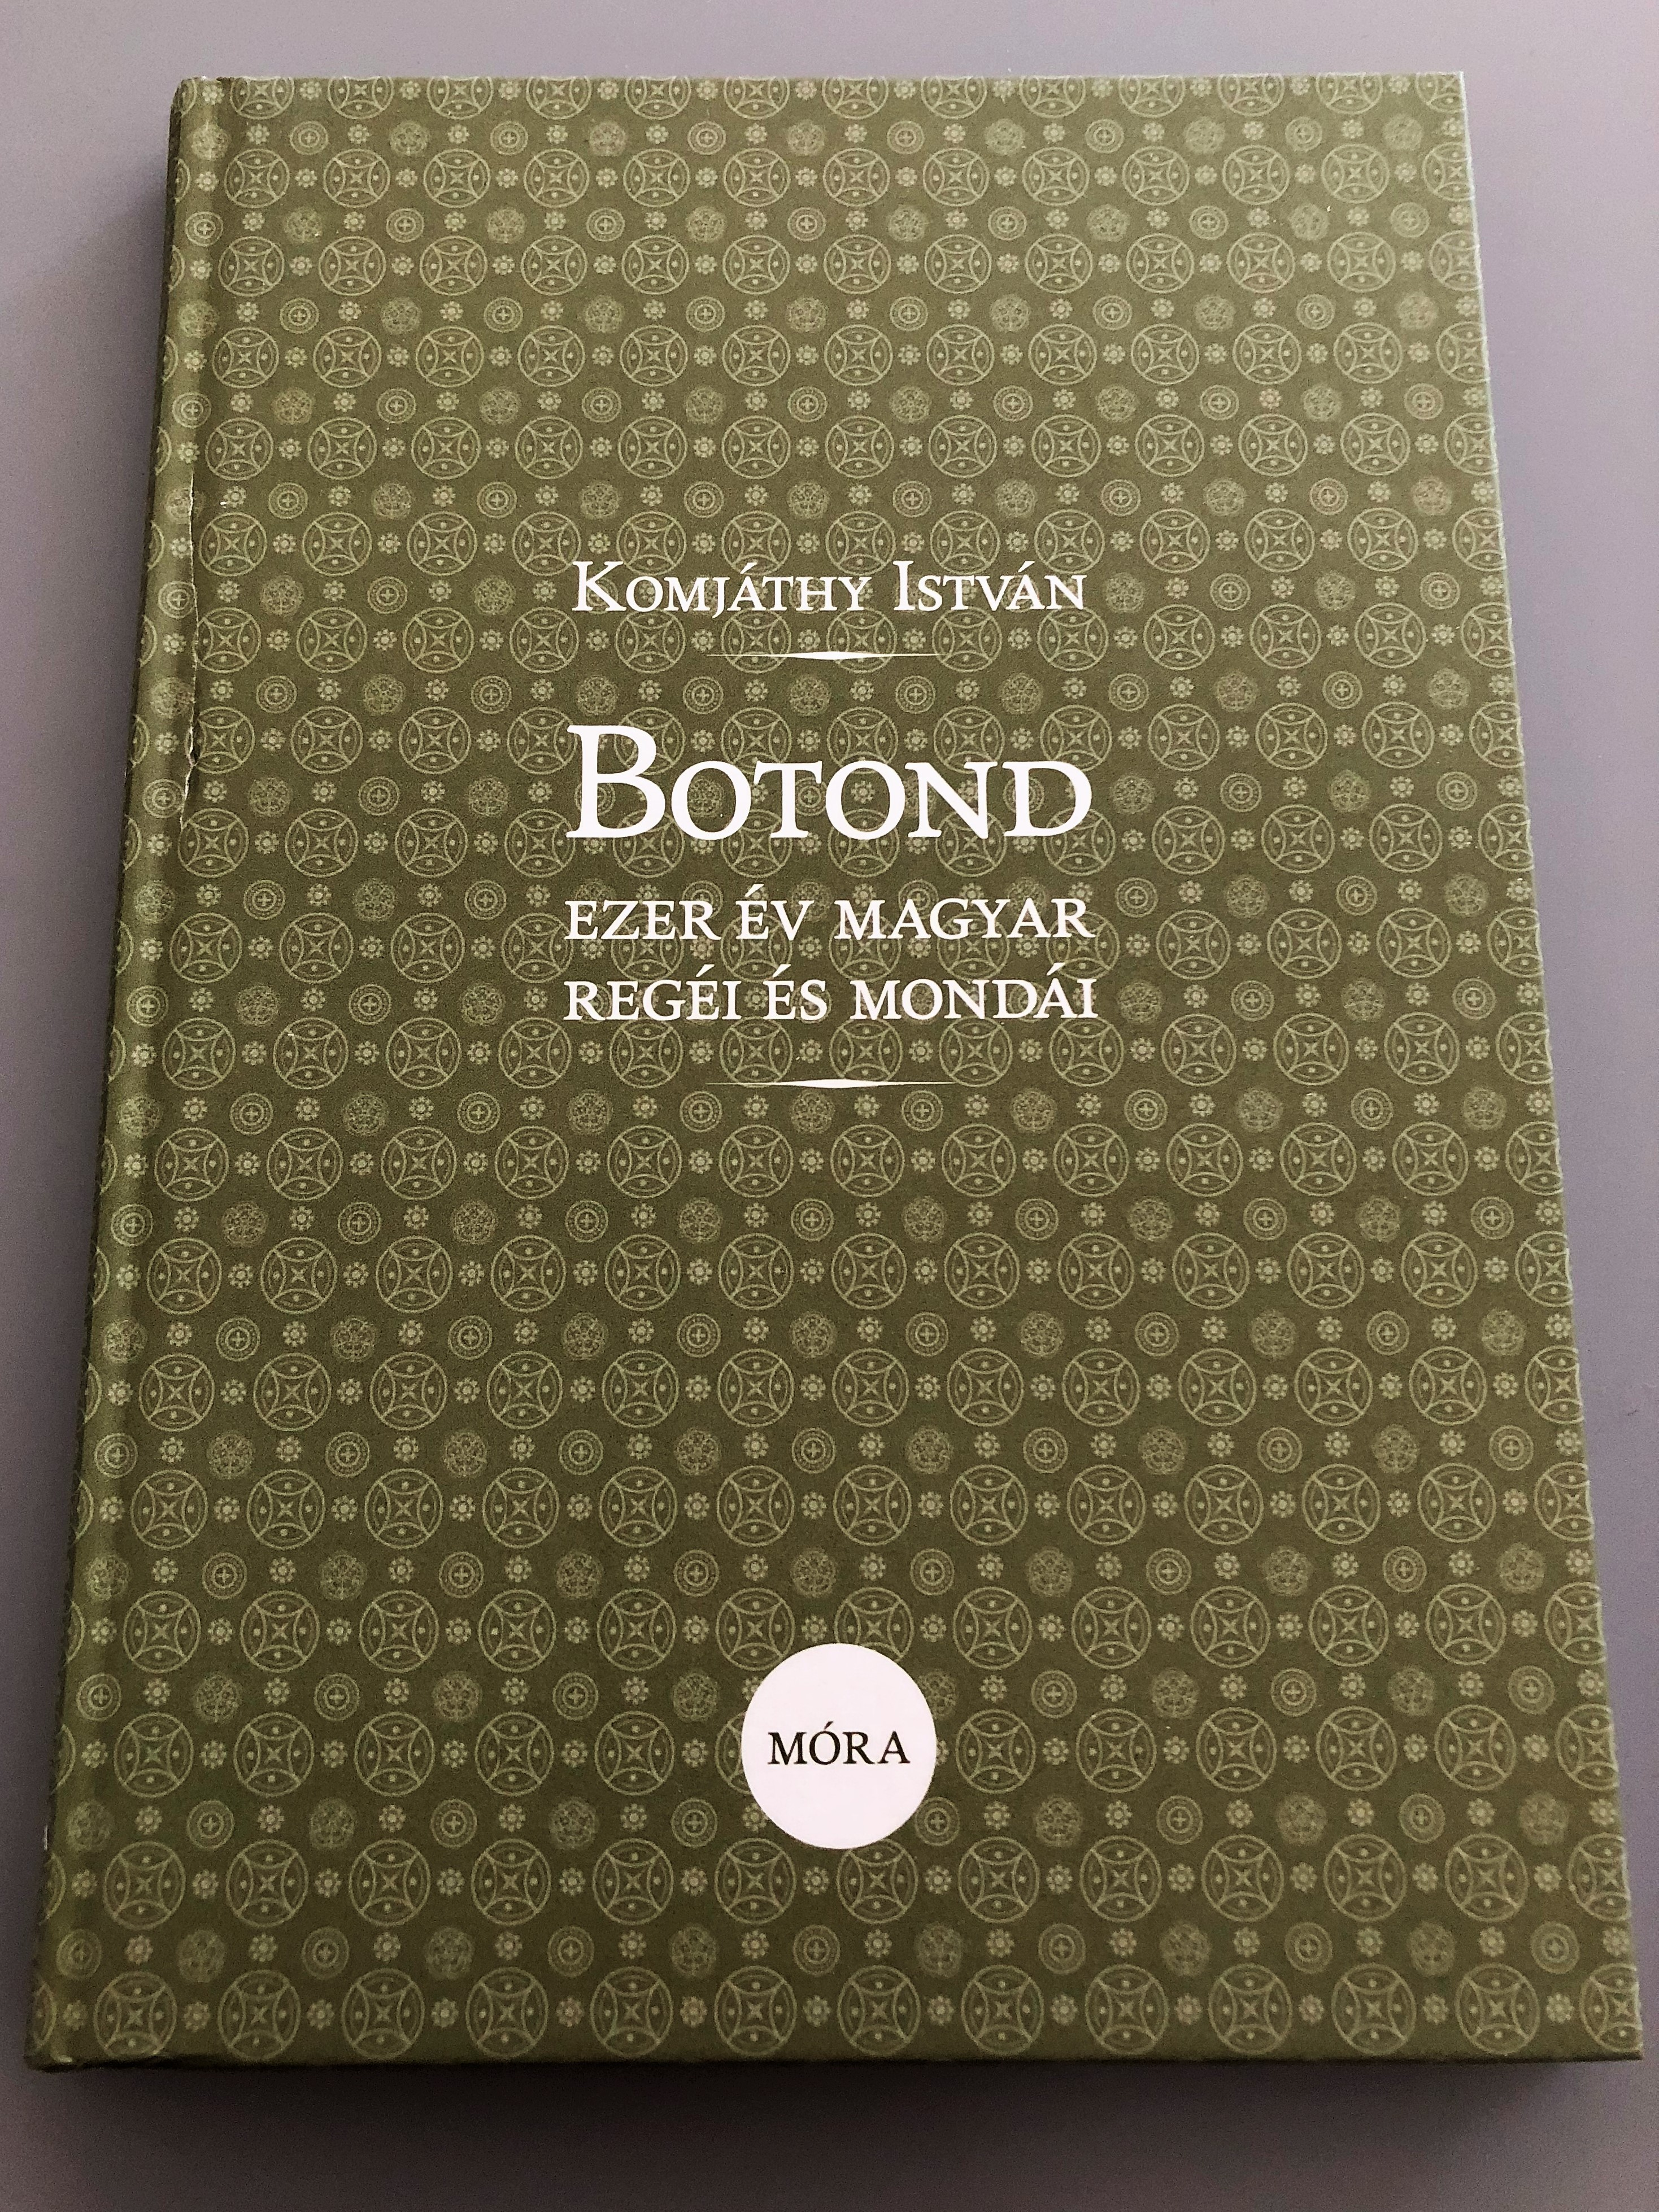 botond-ezer-v-magyar-reg-i-s-mond-i-by-komj-thy-istv-n-a-1000-years-of-hungarian-tales-and-legends-1-.jpg